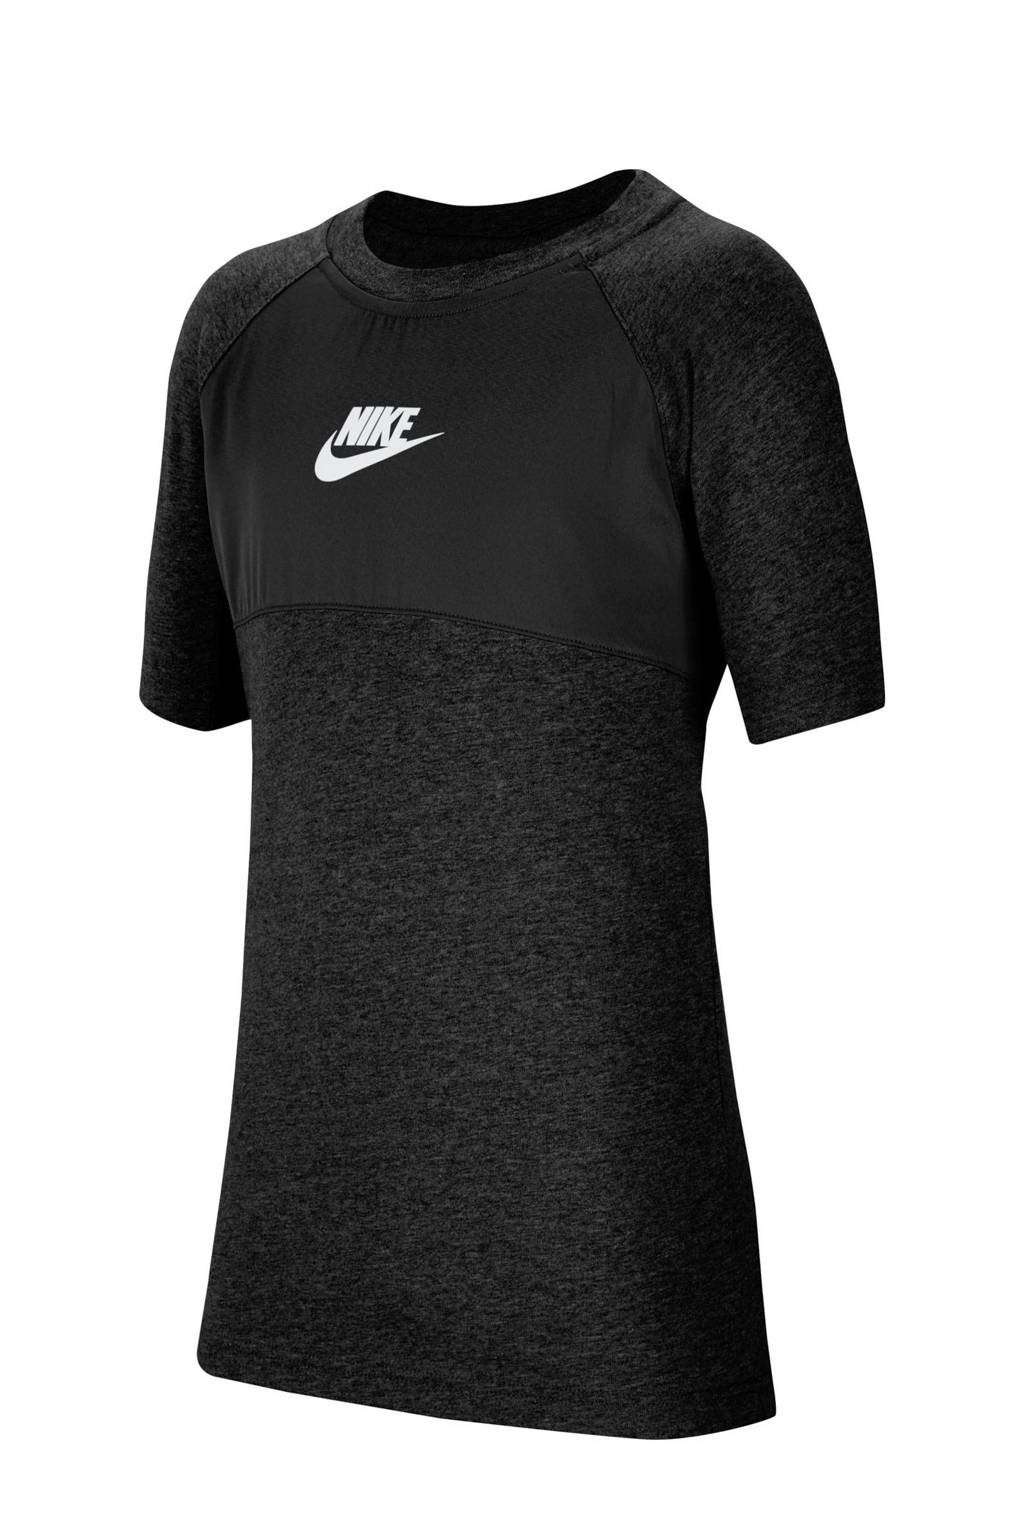 Nike   T-shirt antraciet, Antraciet